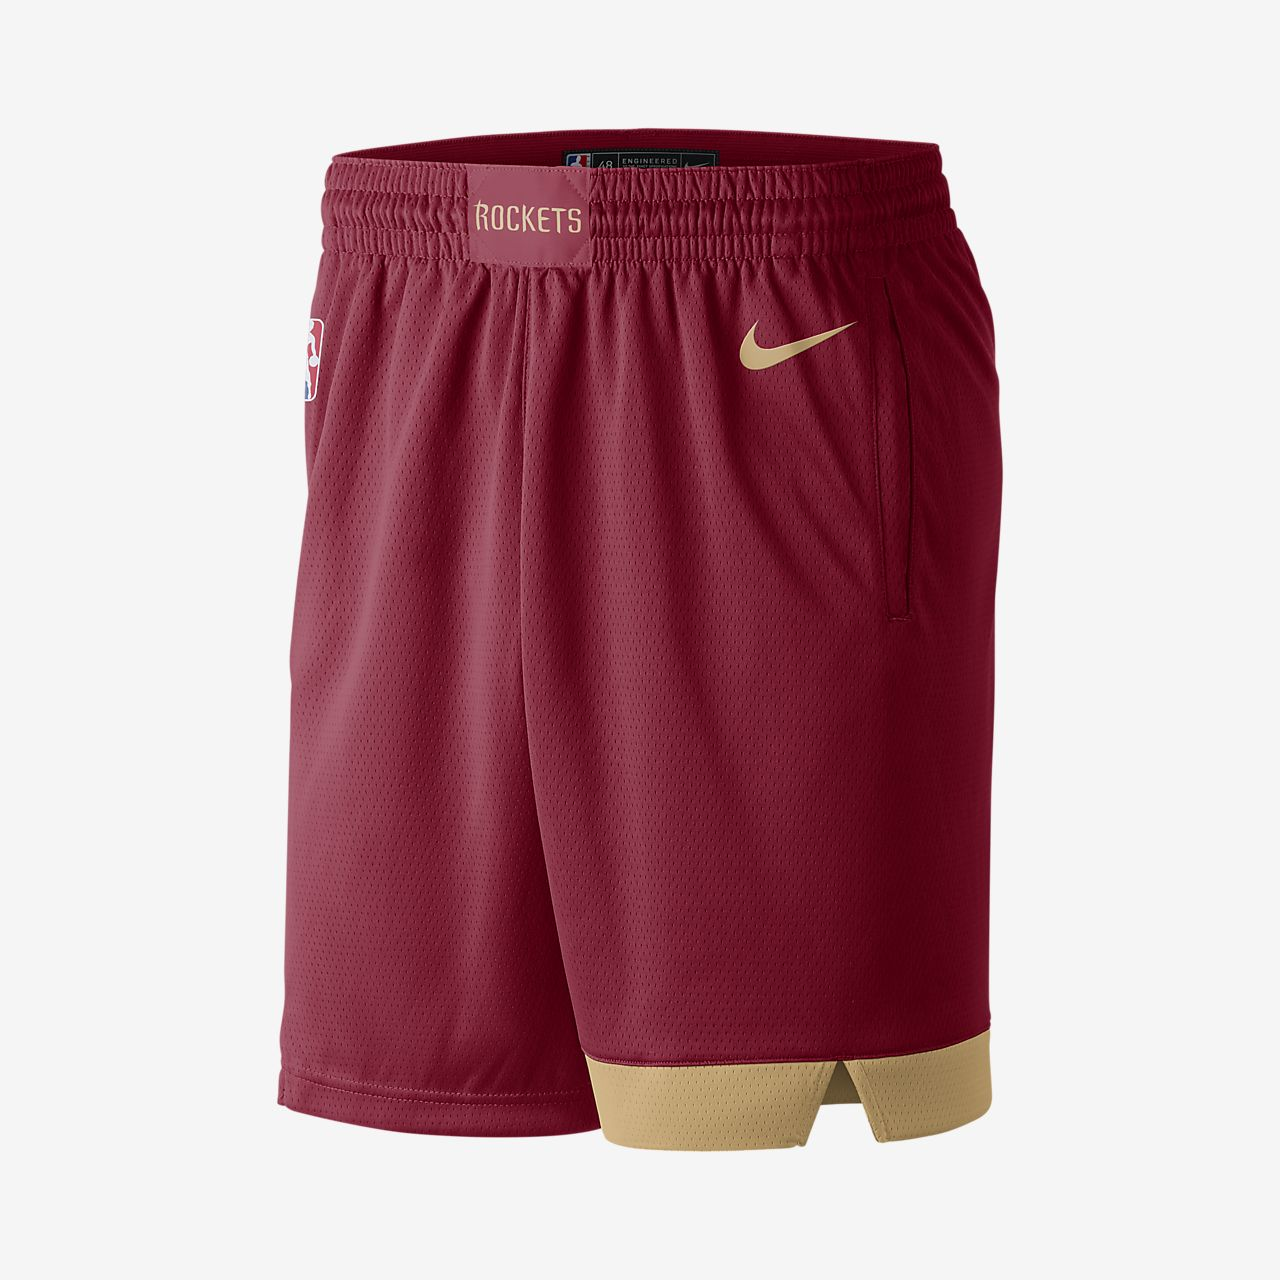 Houston Rockets City Edition Swingman NBA-Shorts für Herren